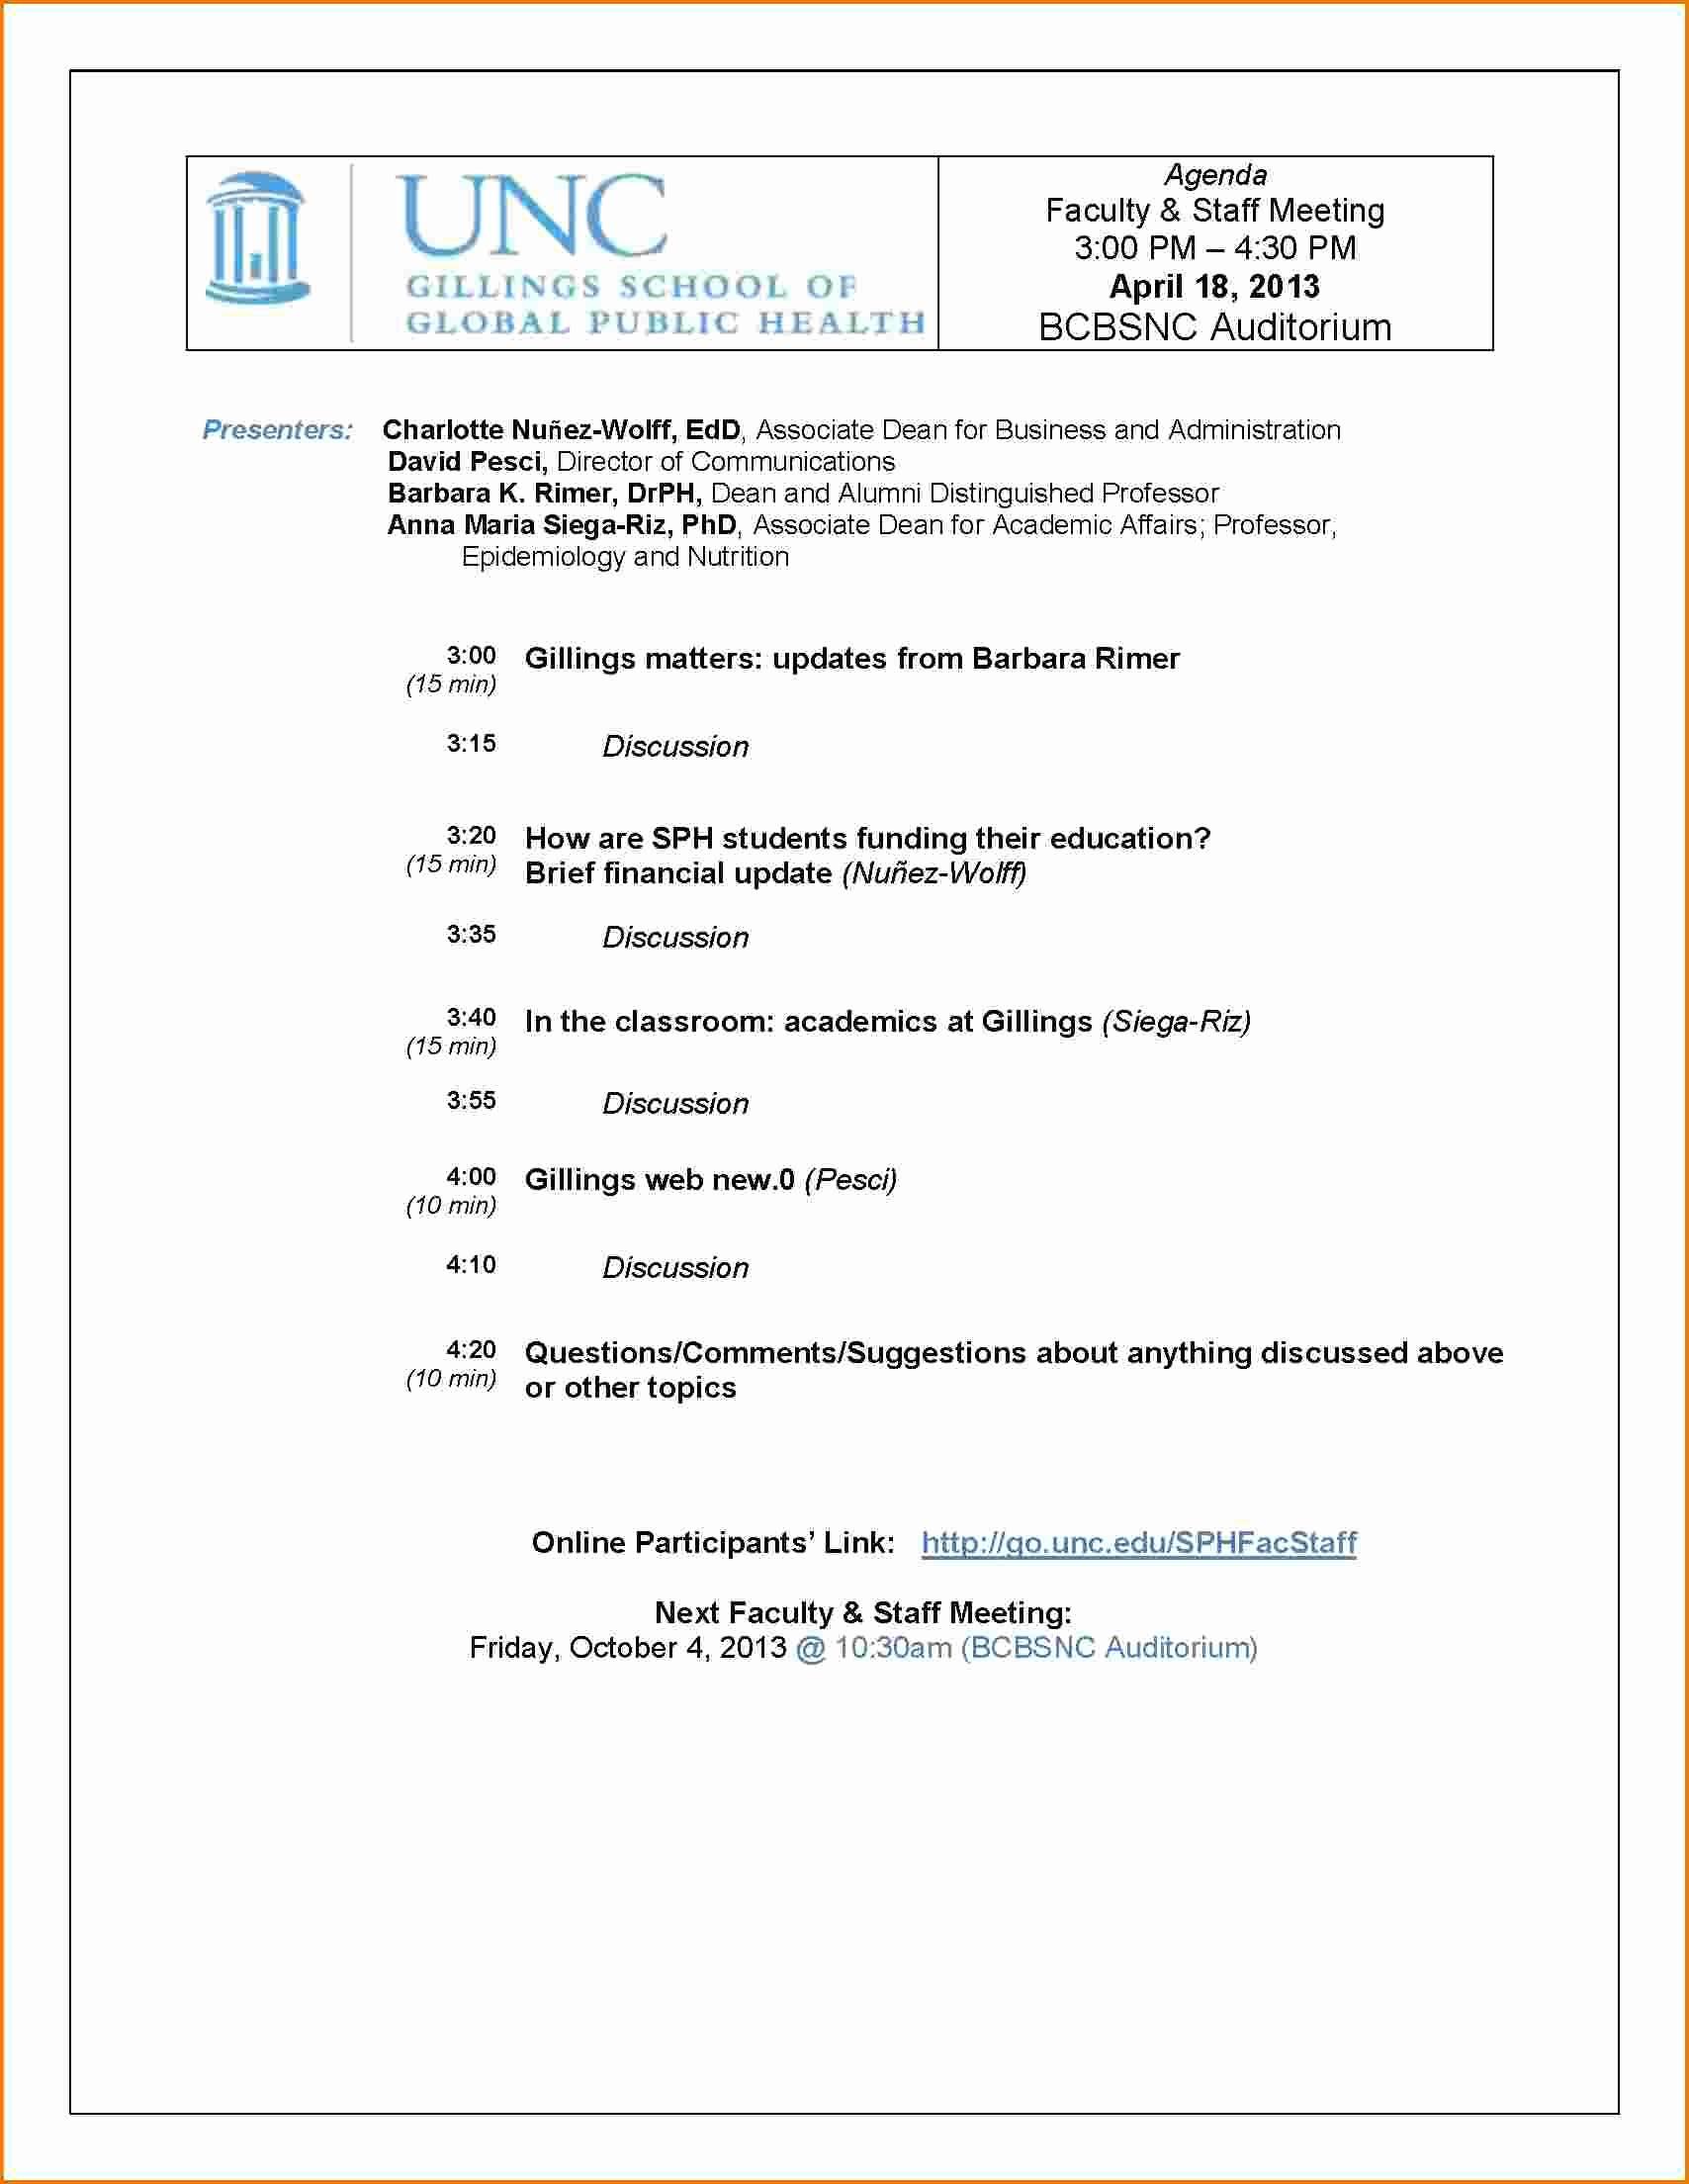 Agenda format for A Meeting Beautiful 6 Meeting Agendas